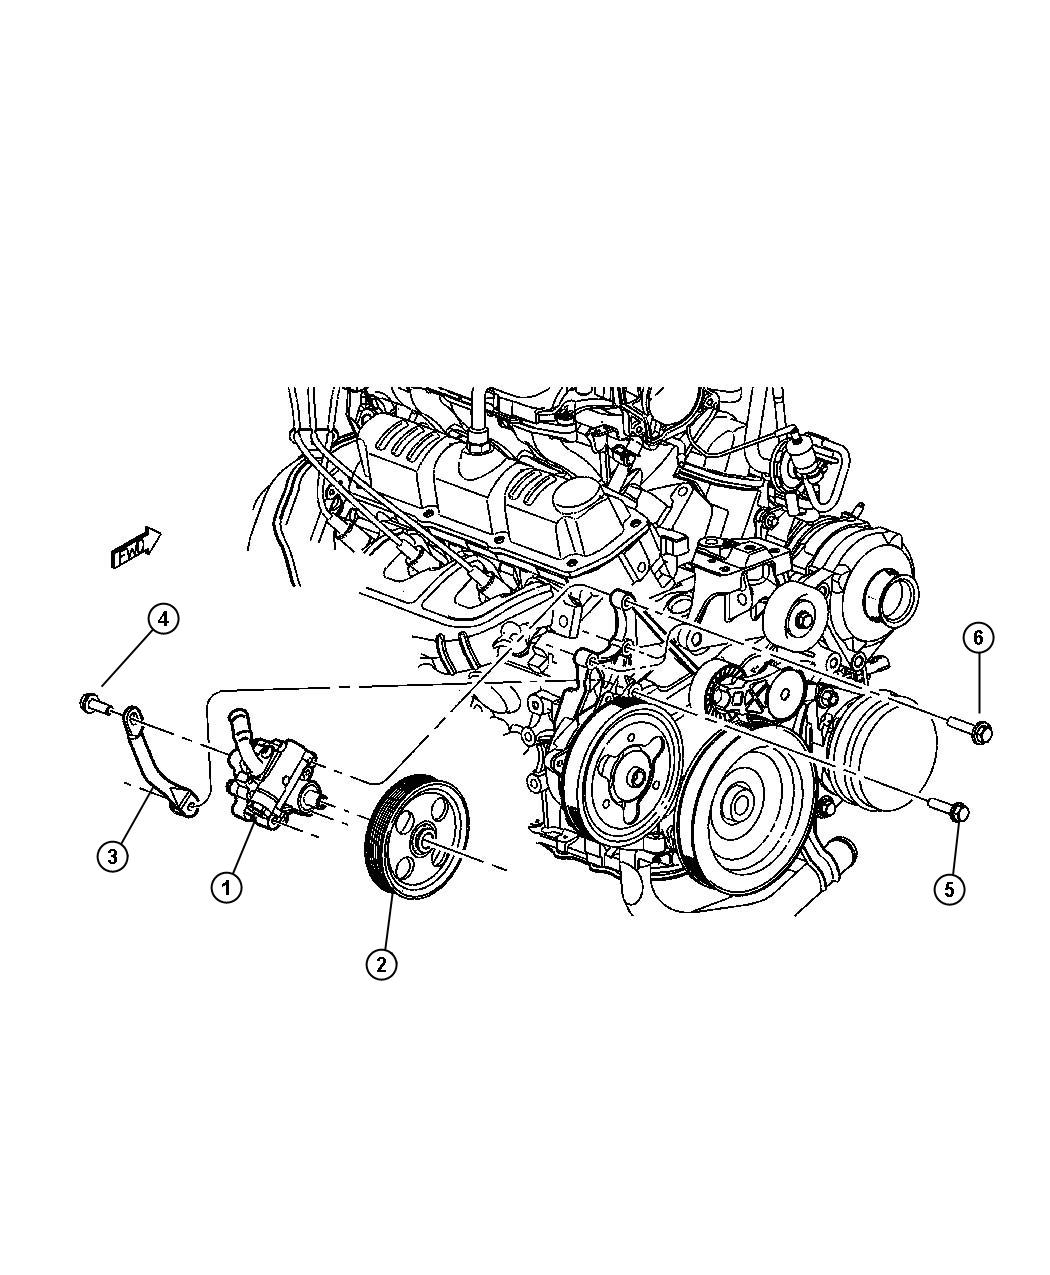 Chrysler Voyager Power Steering Pump 3 3l 3 8l Engine